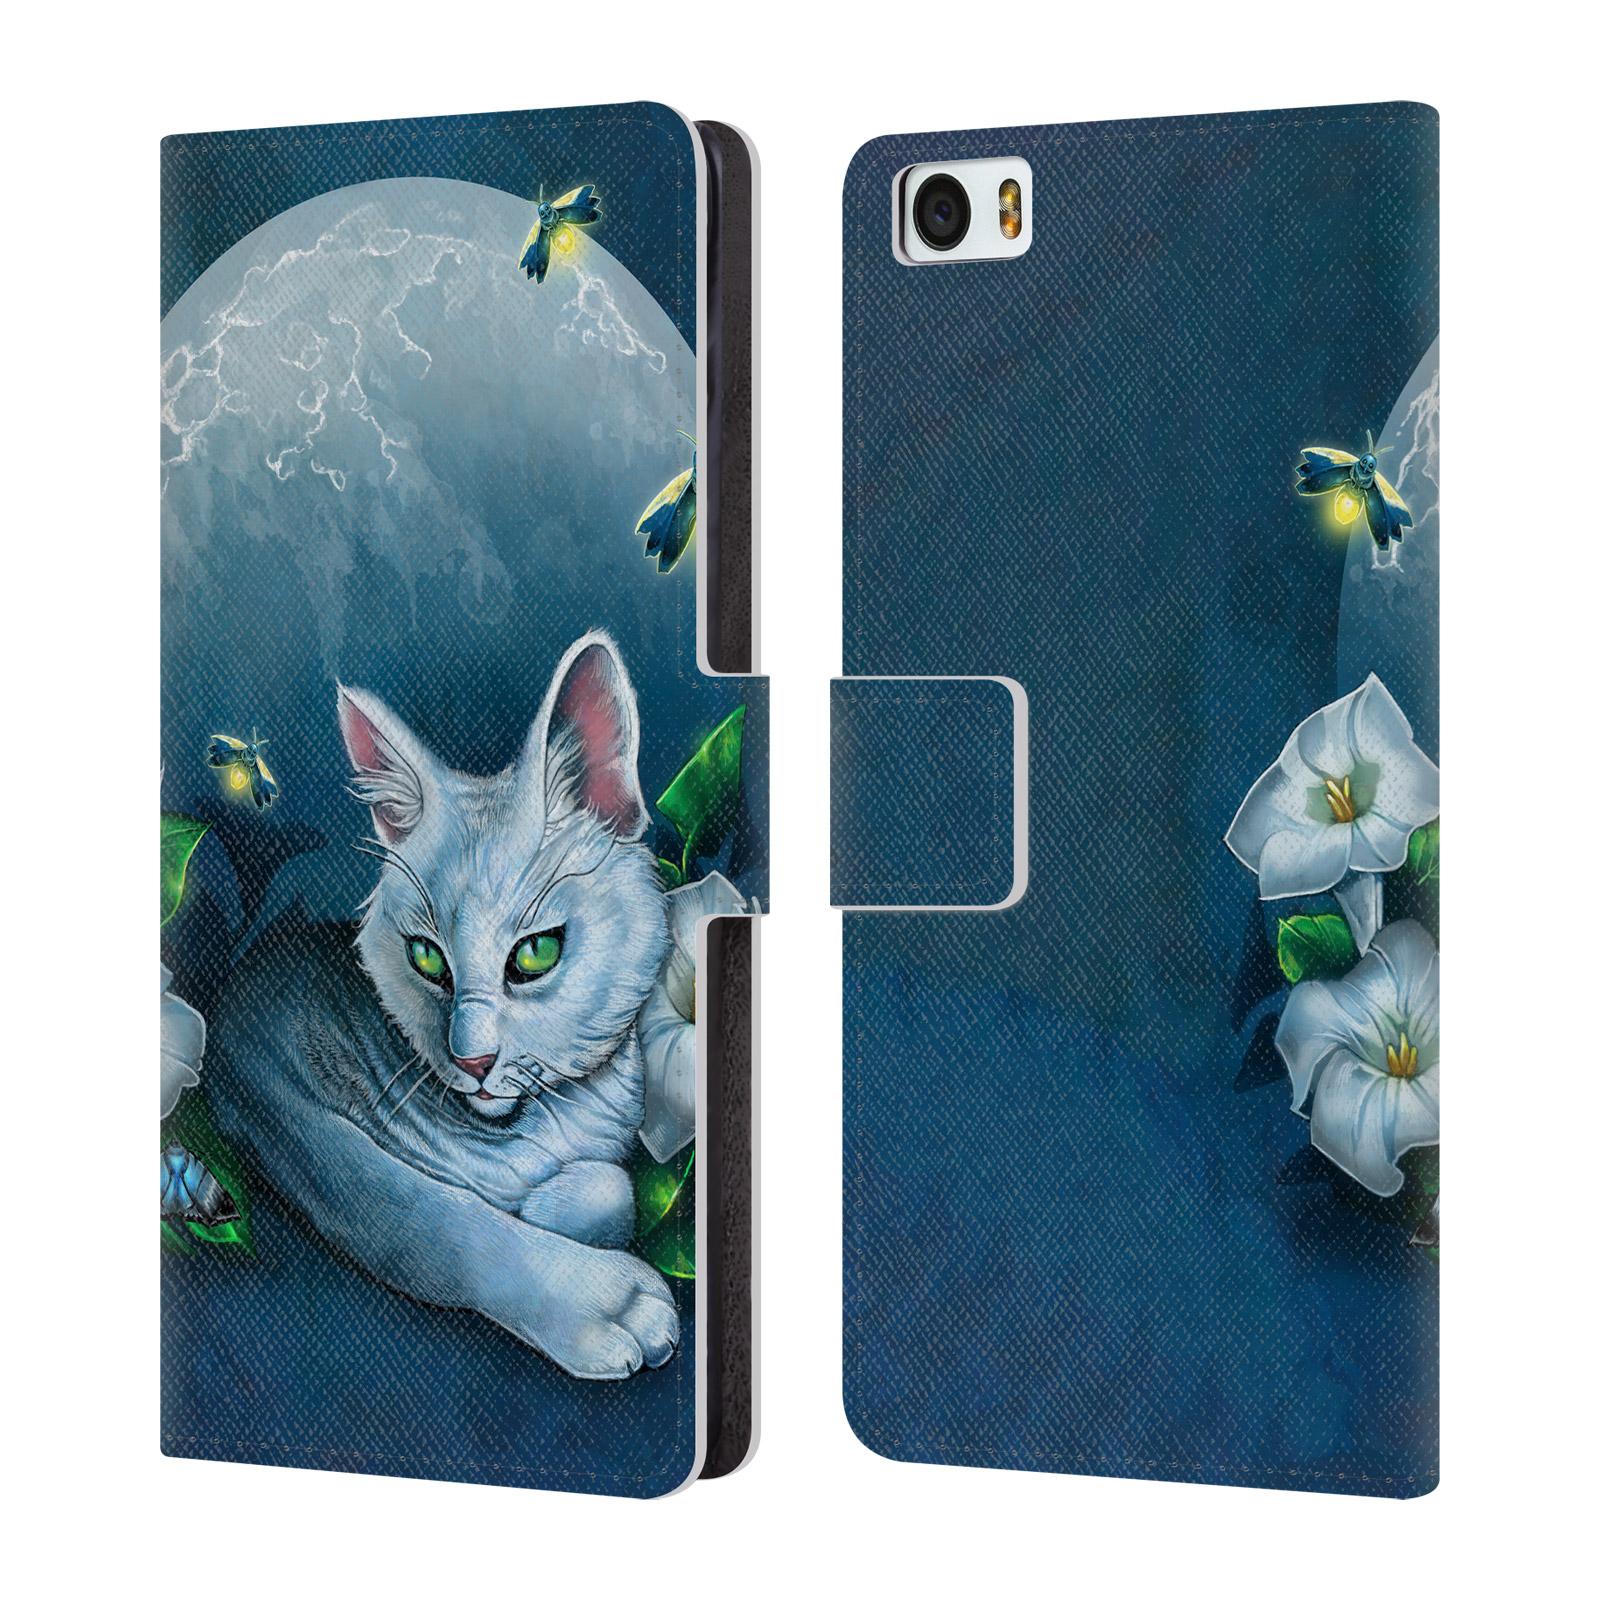 OFFICIAL-RENEE-BIERTEMPFEL-ANIMALS-LEATHER-BOOK-WALLET-CASE-FOR-XIAOMI-PHONES